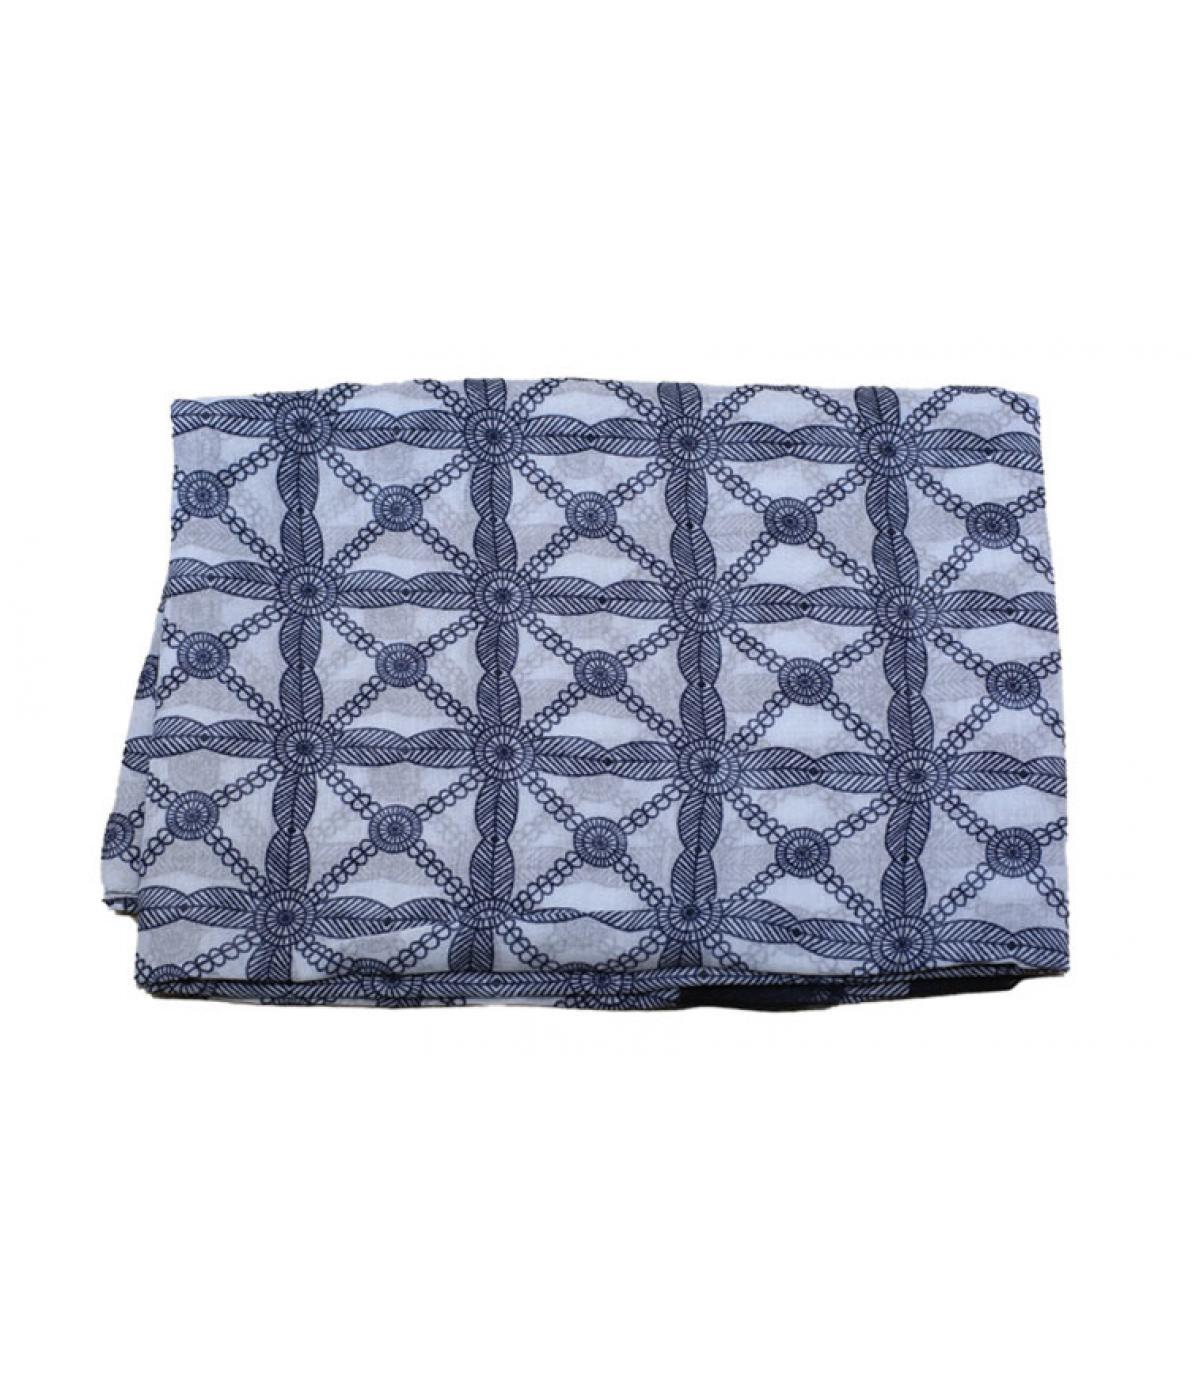 blauw wit sjaalpatroon